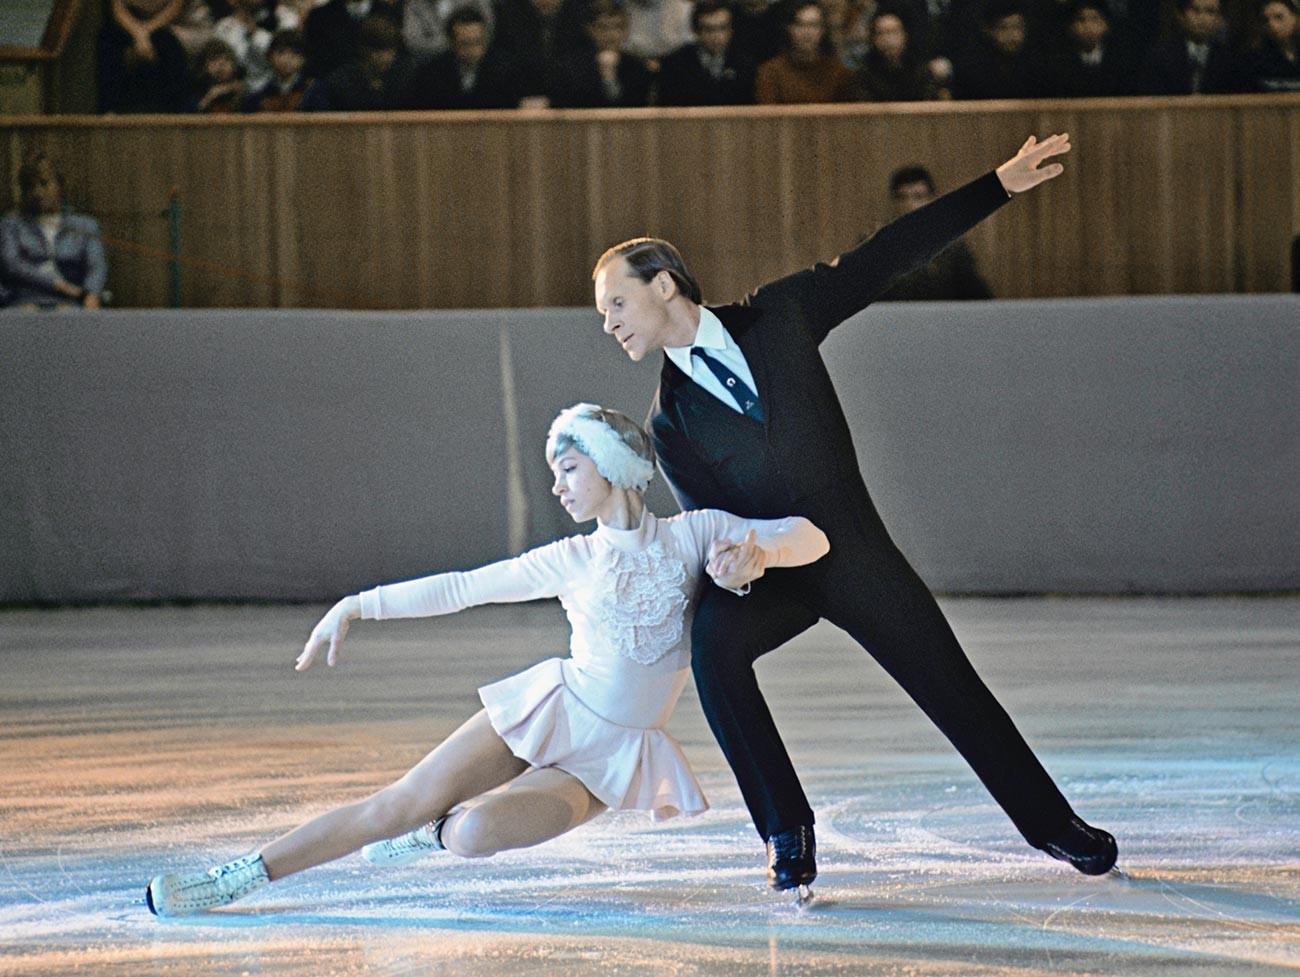 Ludmila Belousova and Oleg Protopopov